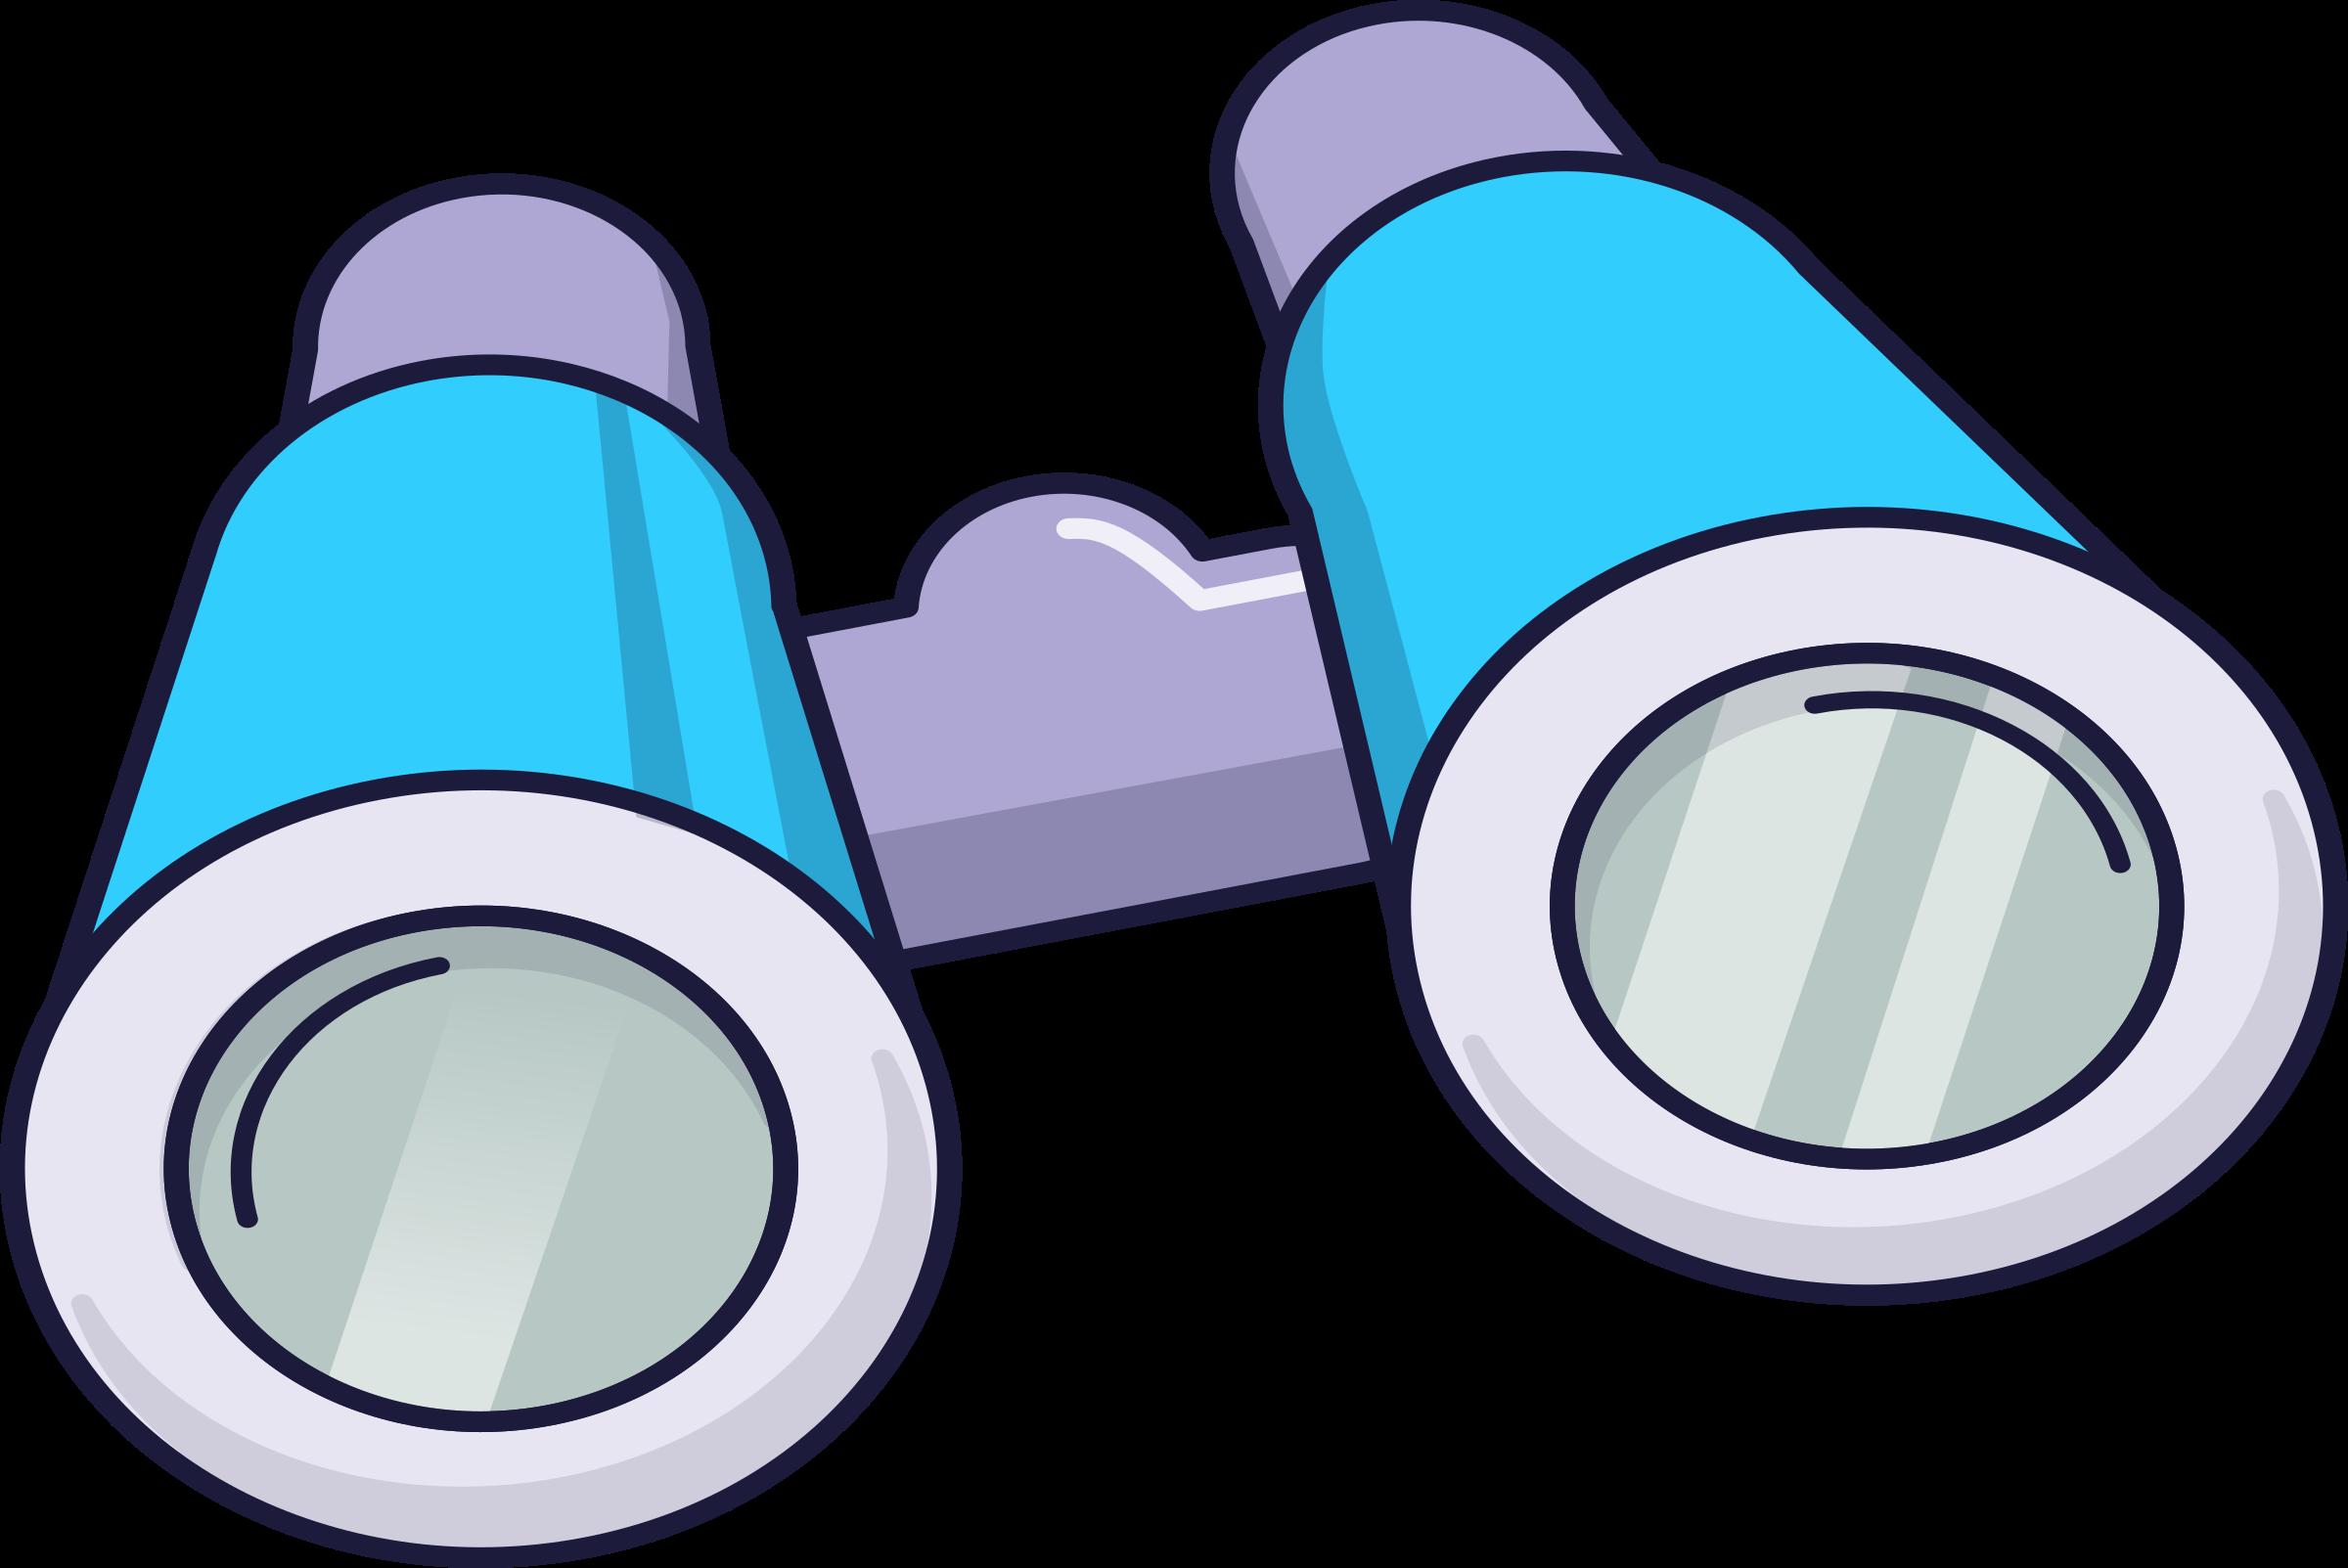 Binoculars clipart blue, Binoculars blue Transparent FREE.